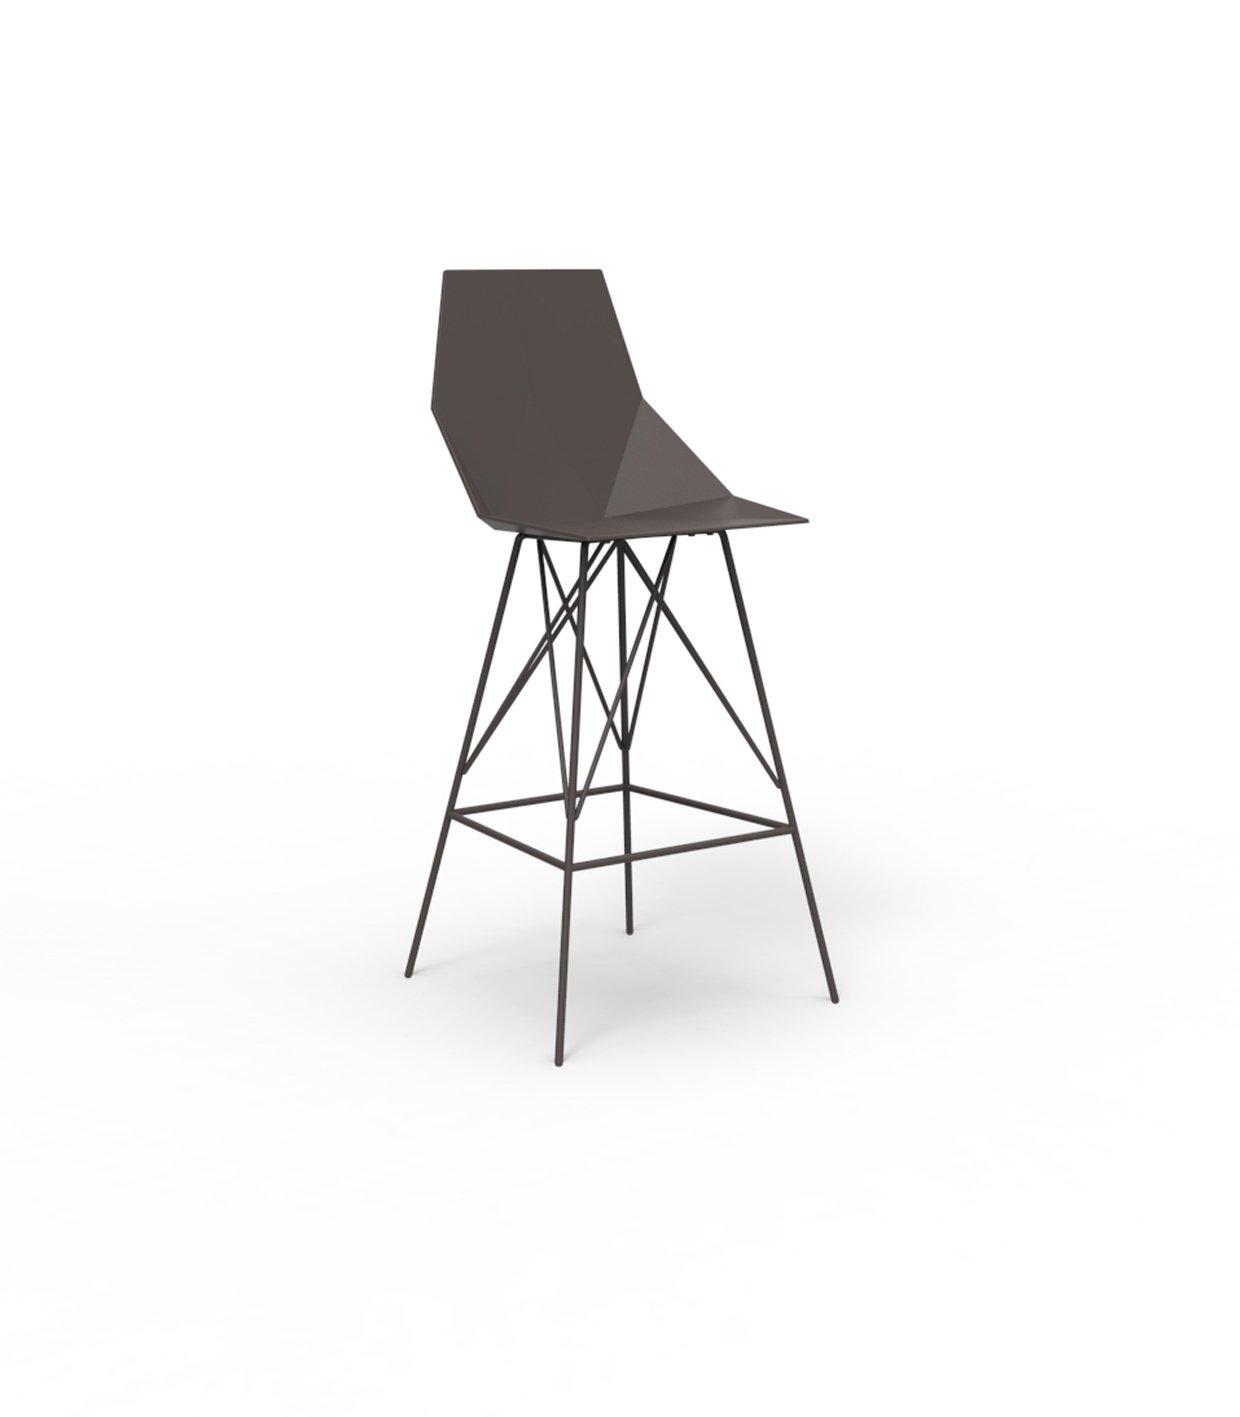 Vondom FAZ Barhocker - bronze - Höhe 111 cm - Ramón Esteve - Design - Barhocker - Gartenstuhl